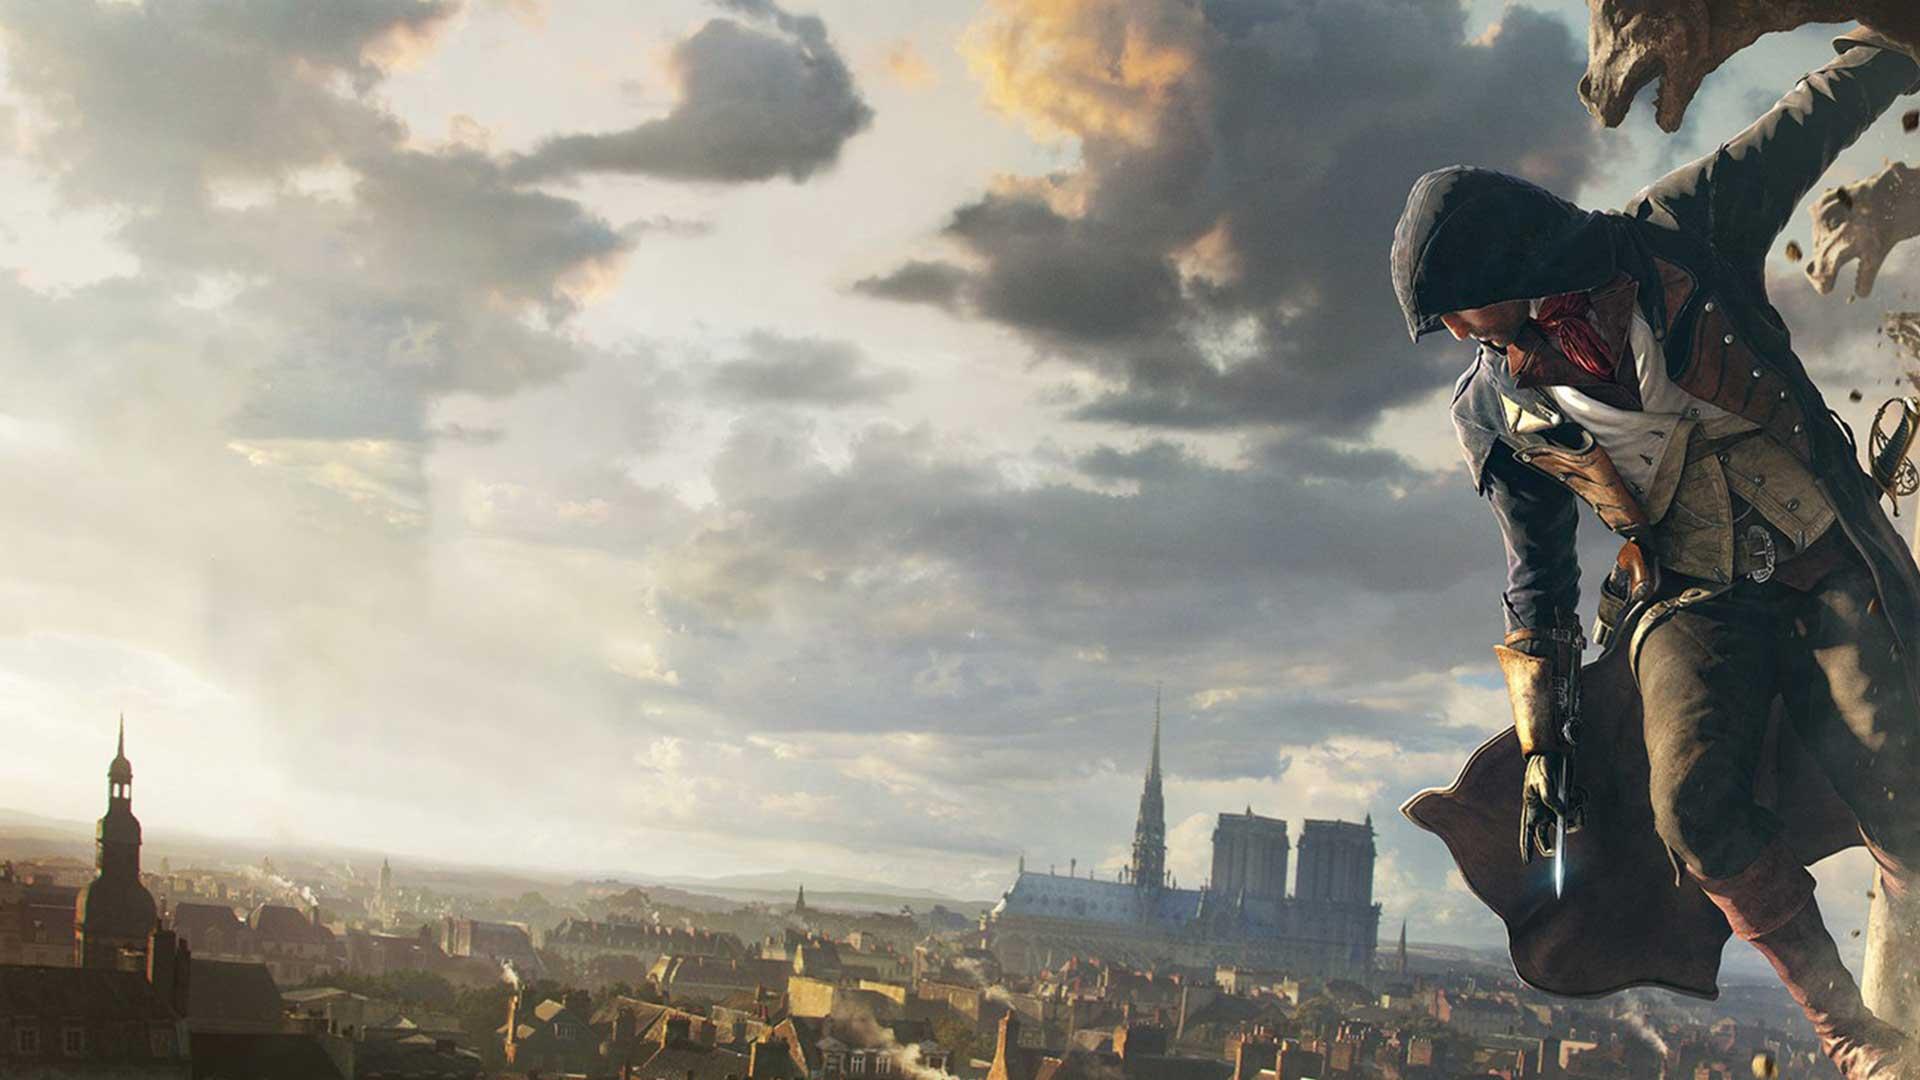 Руководство по загадке Нострадамуса в игре Assassin's Creed Unity (Телец)